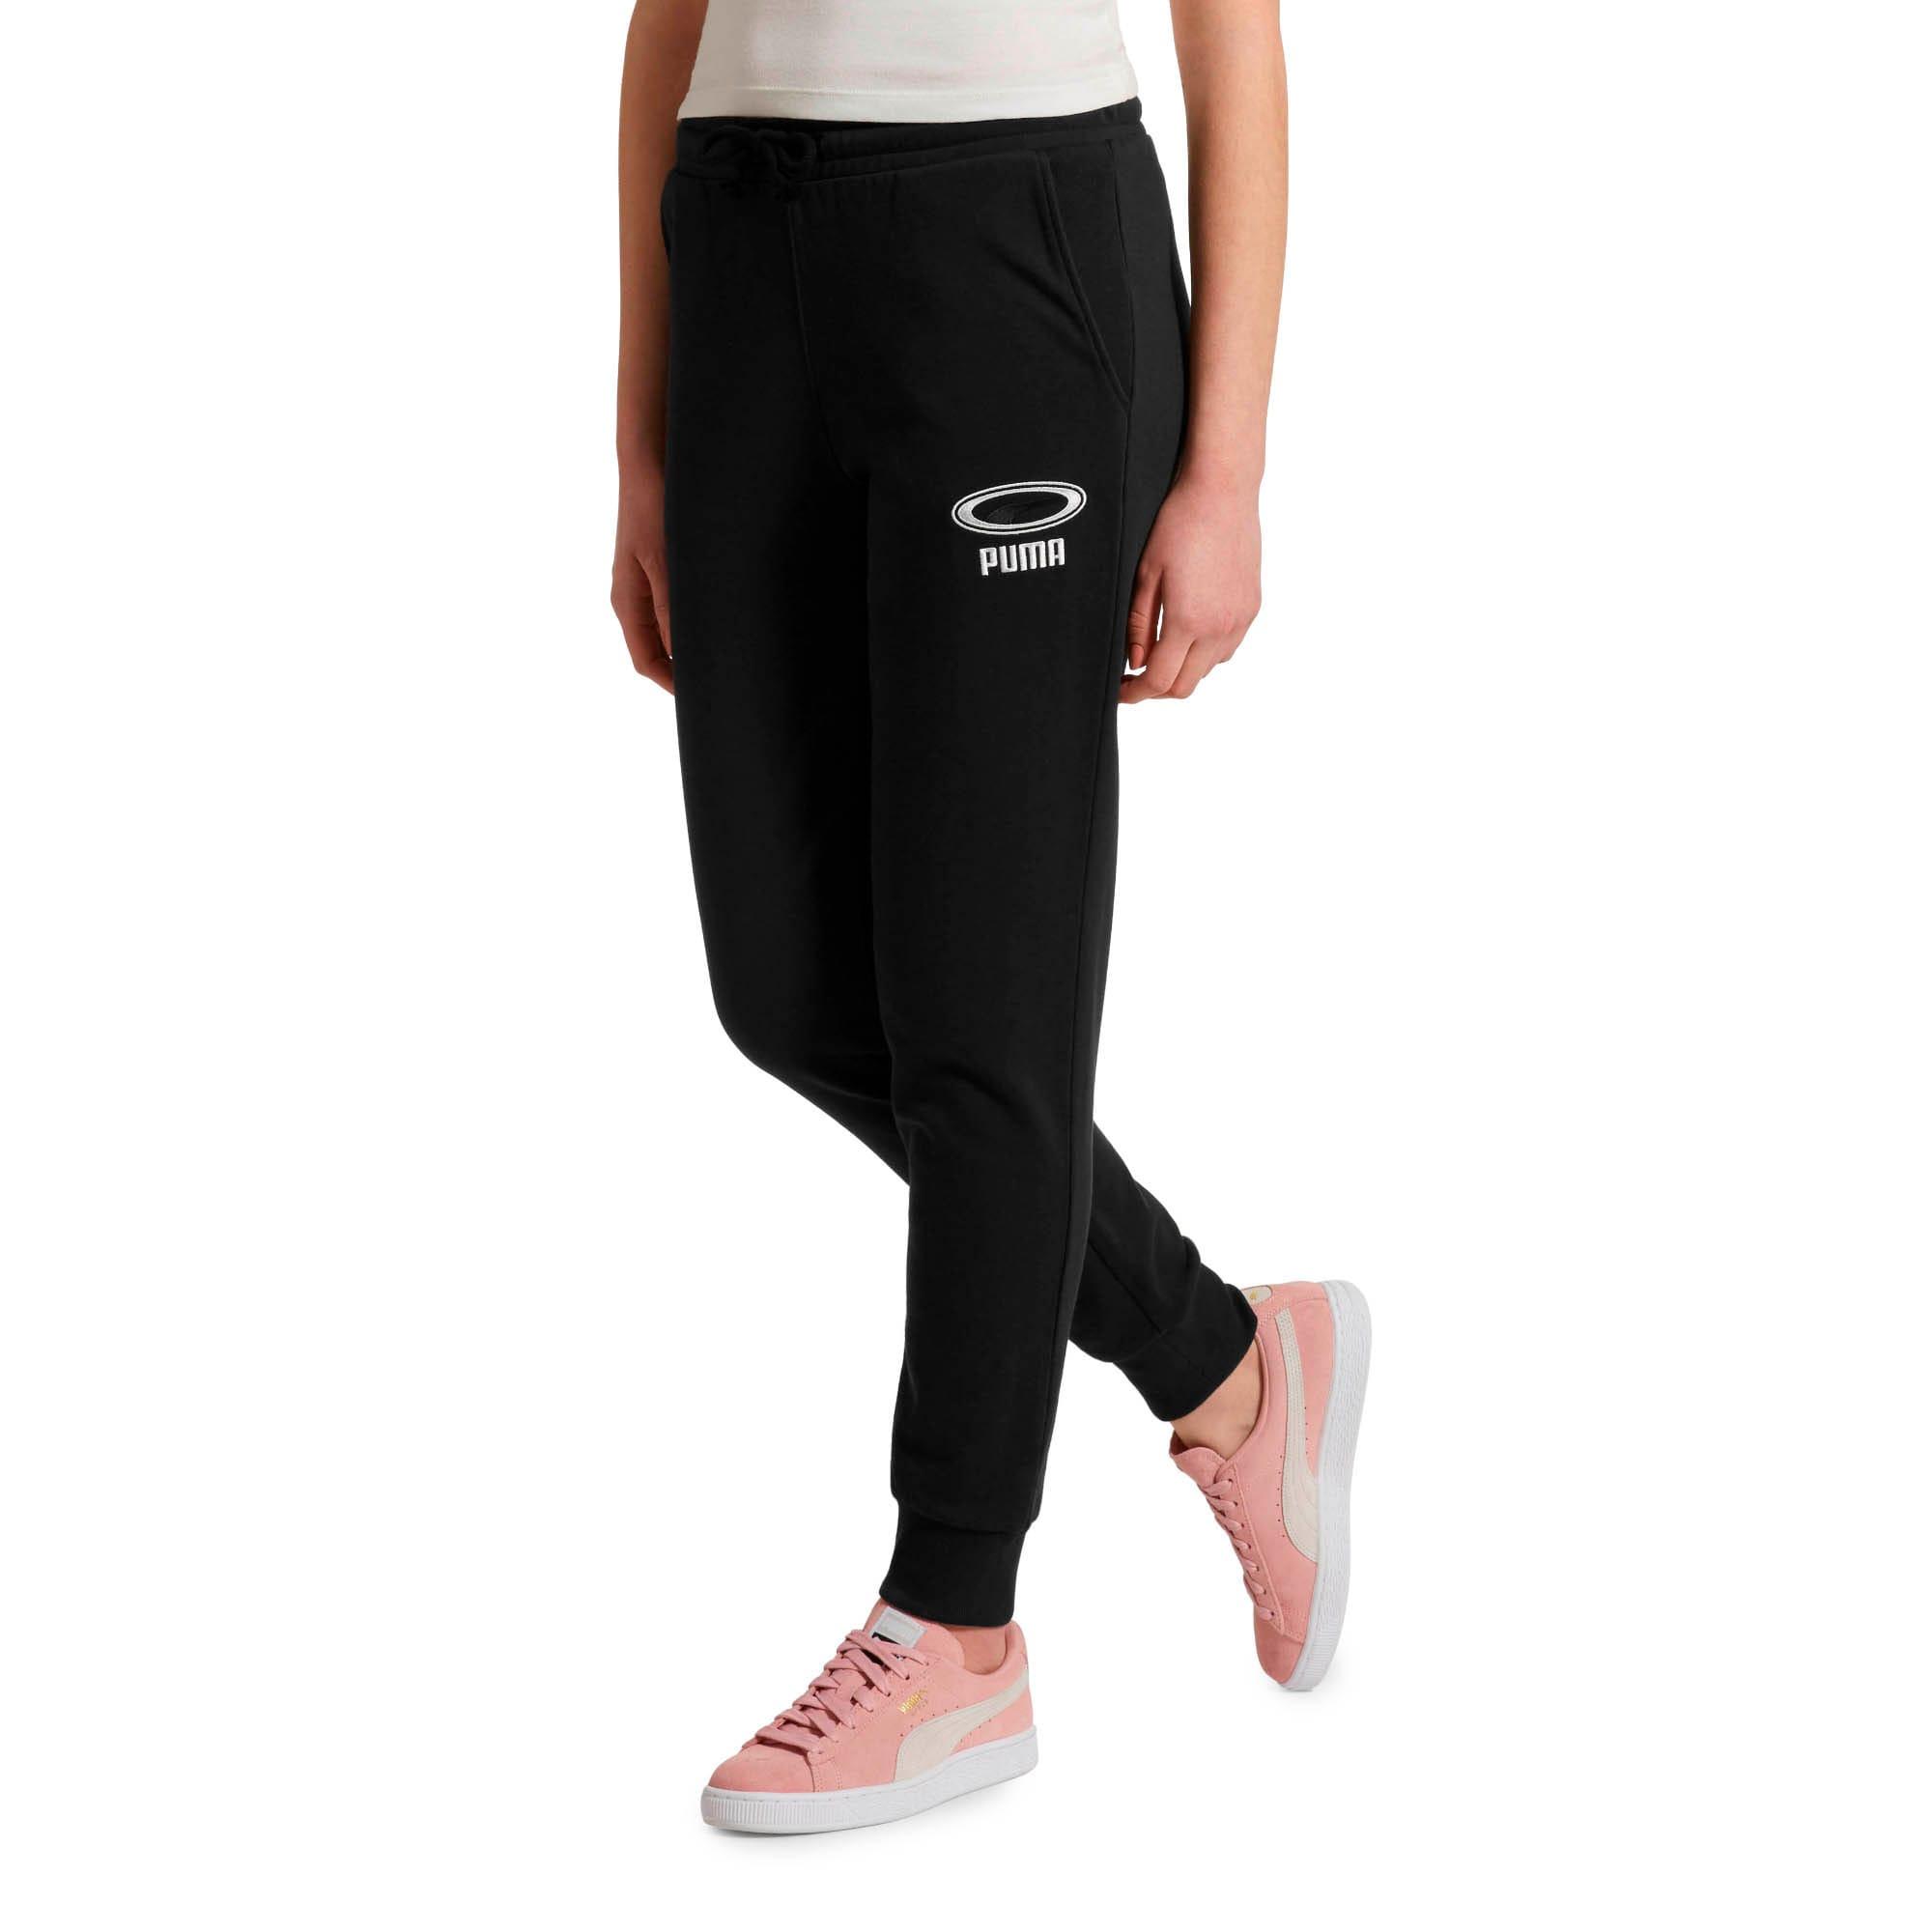 Thumbnail 2 of OG Women's Cuffed Pants, Puma Black, medium